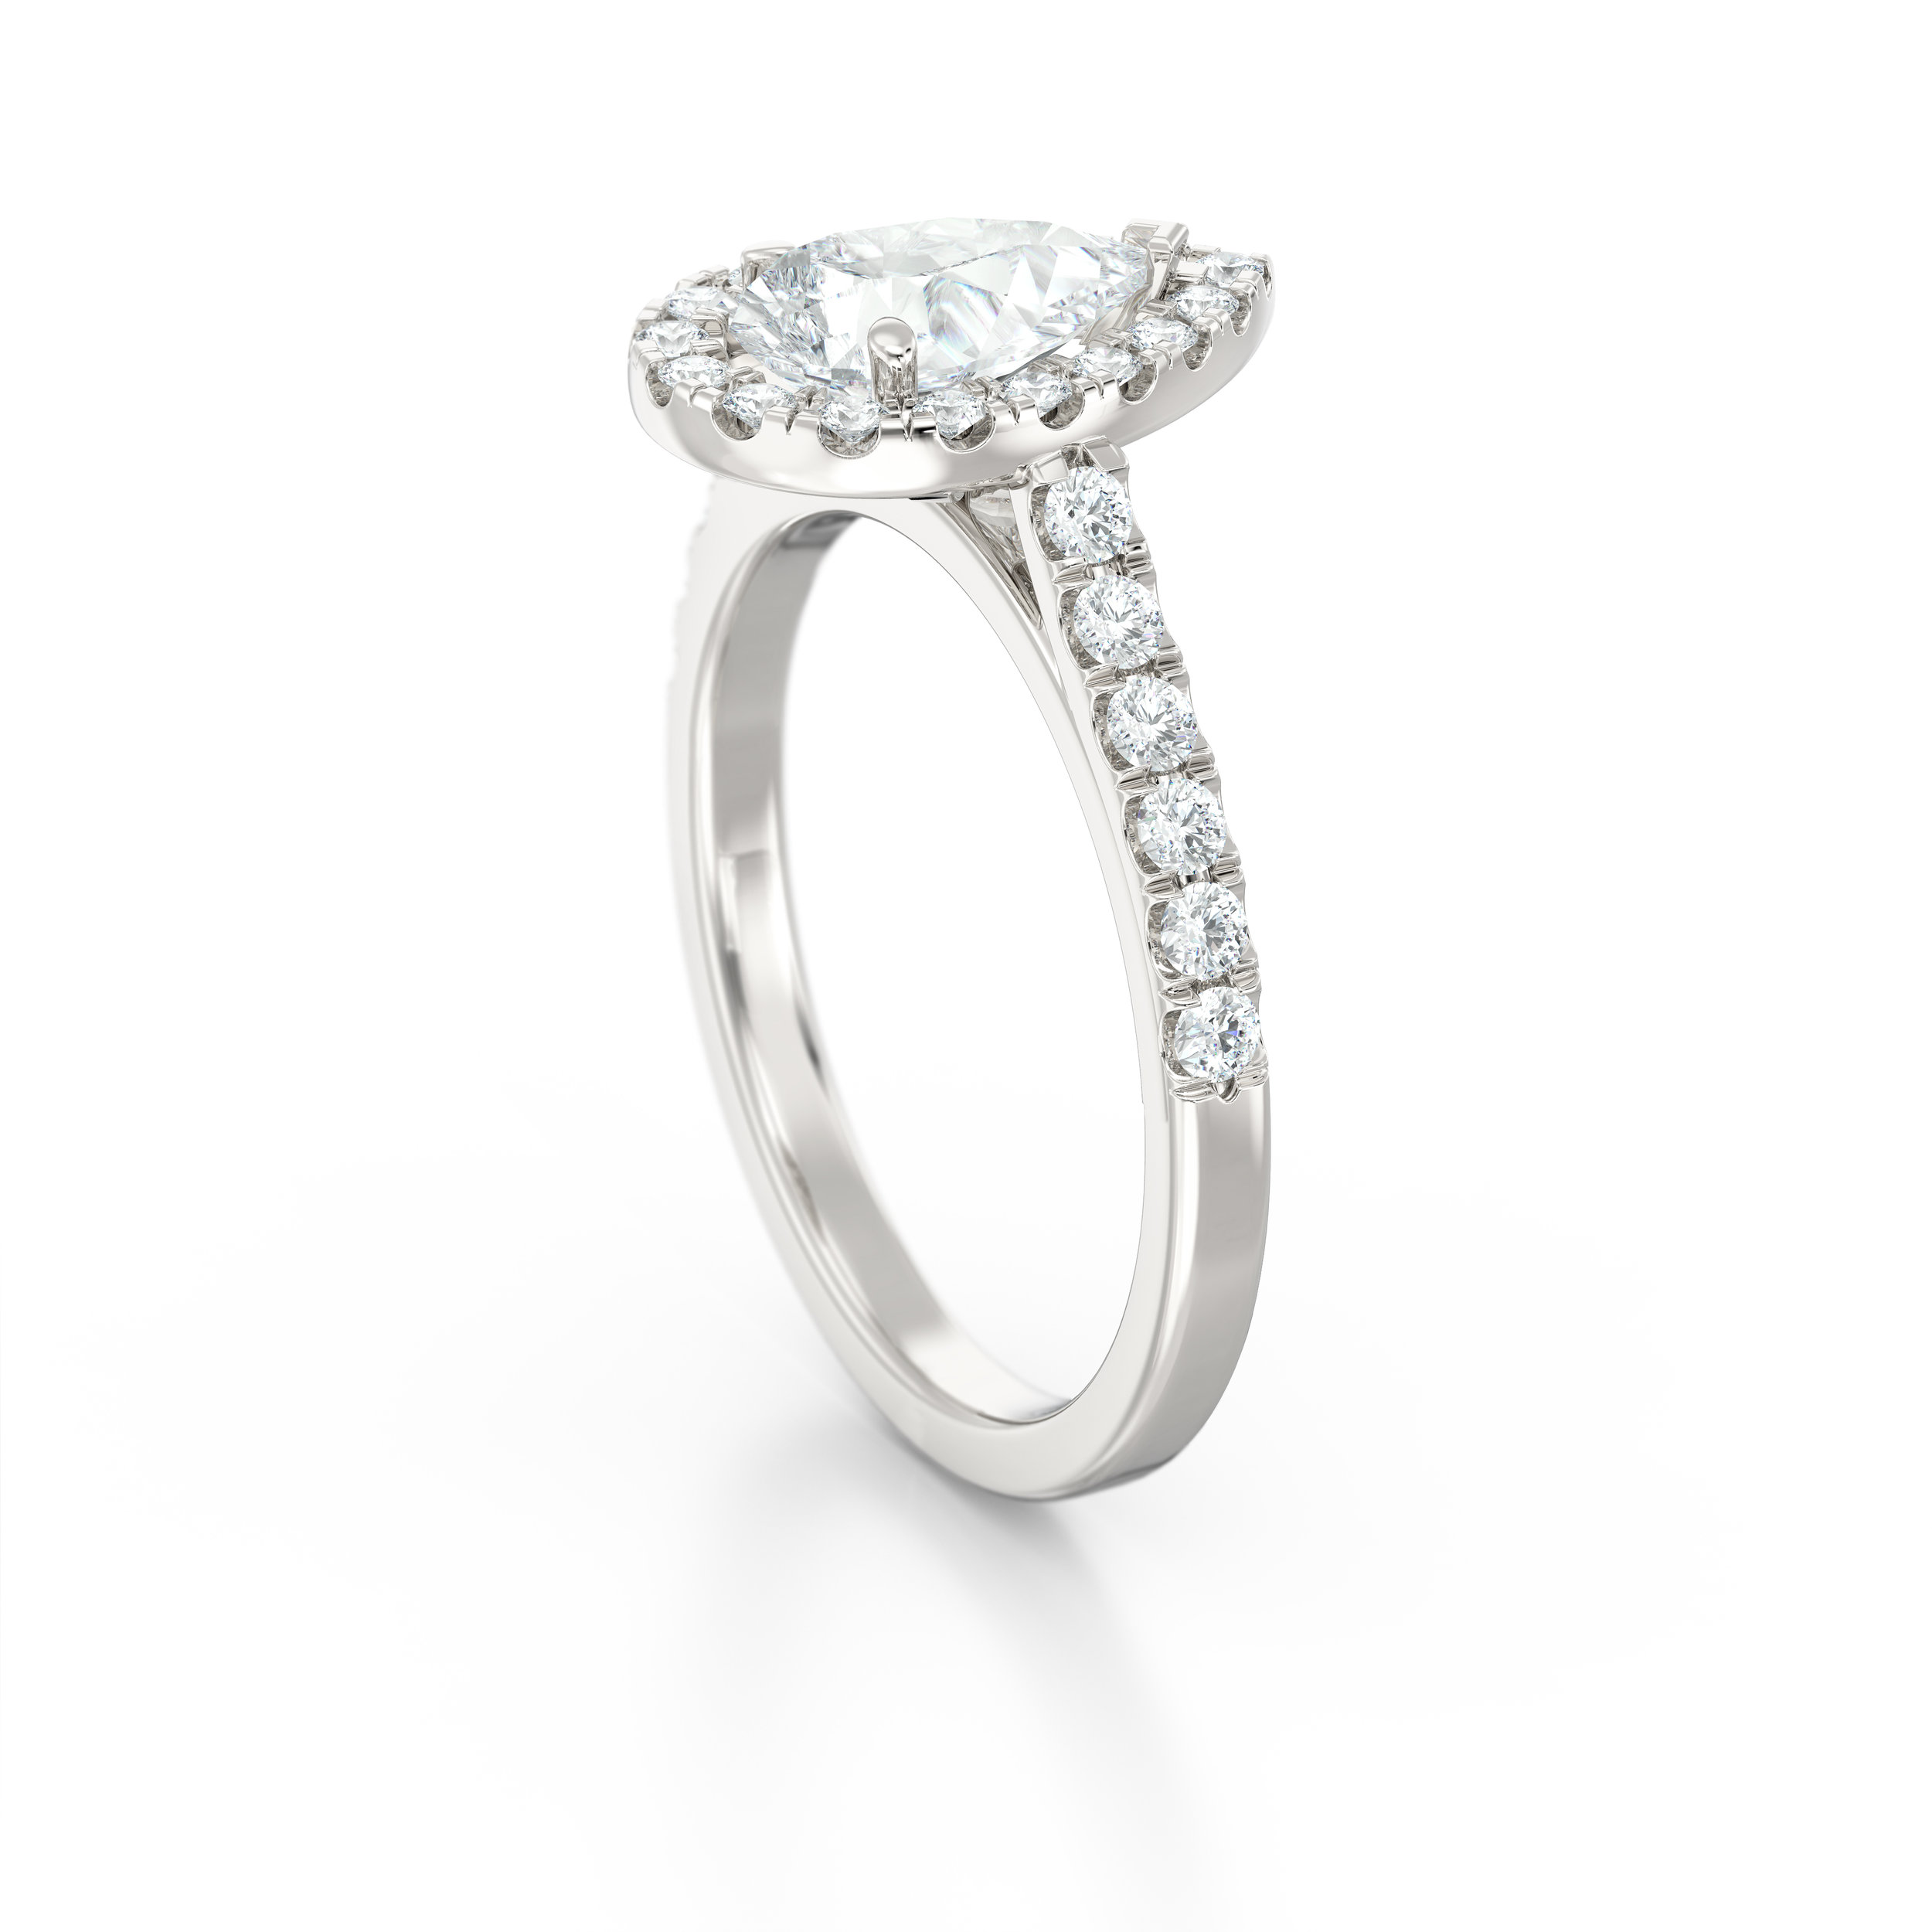 Pear shape diamond halo engagement ring